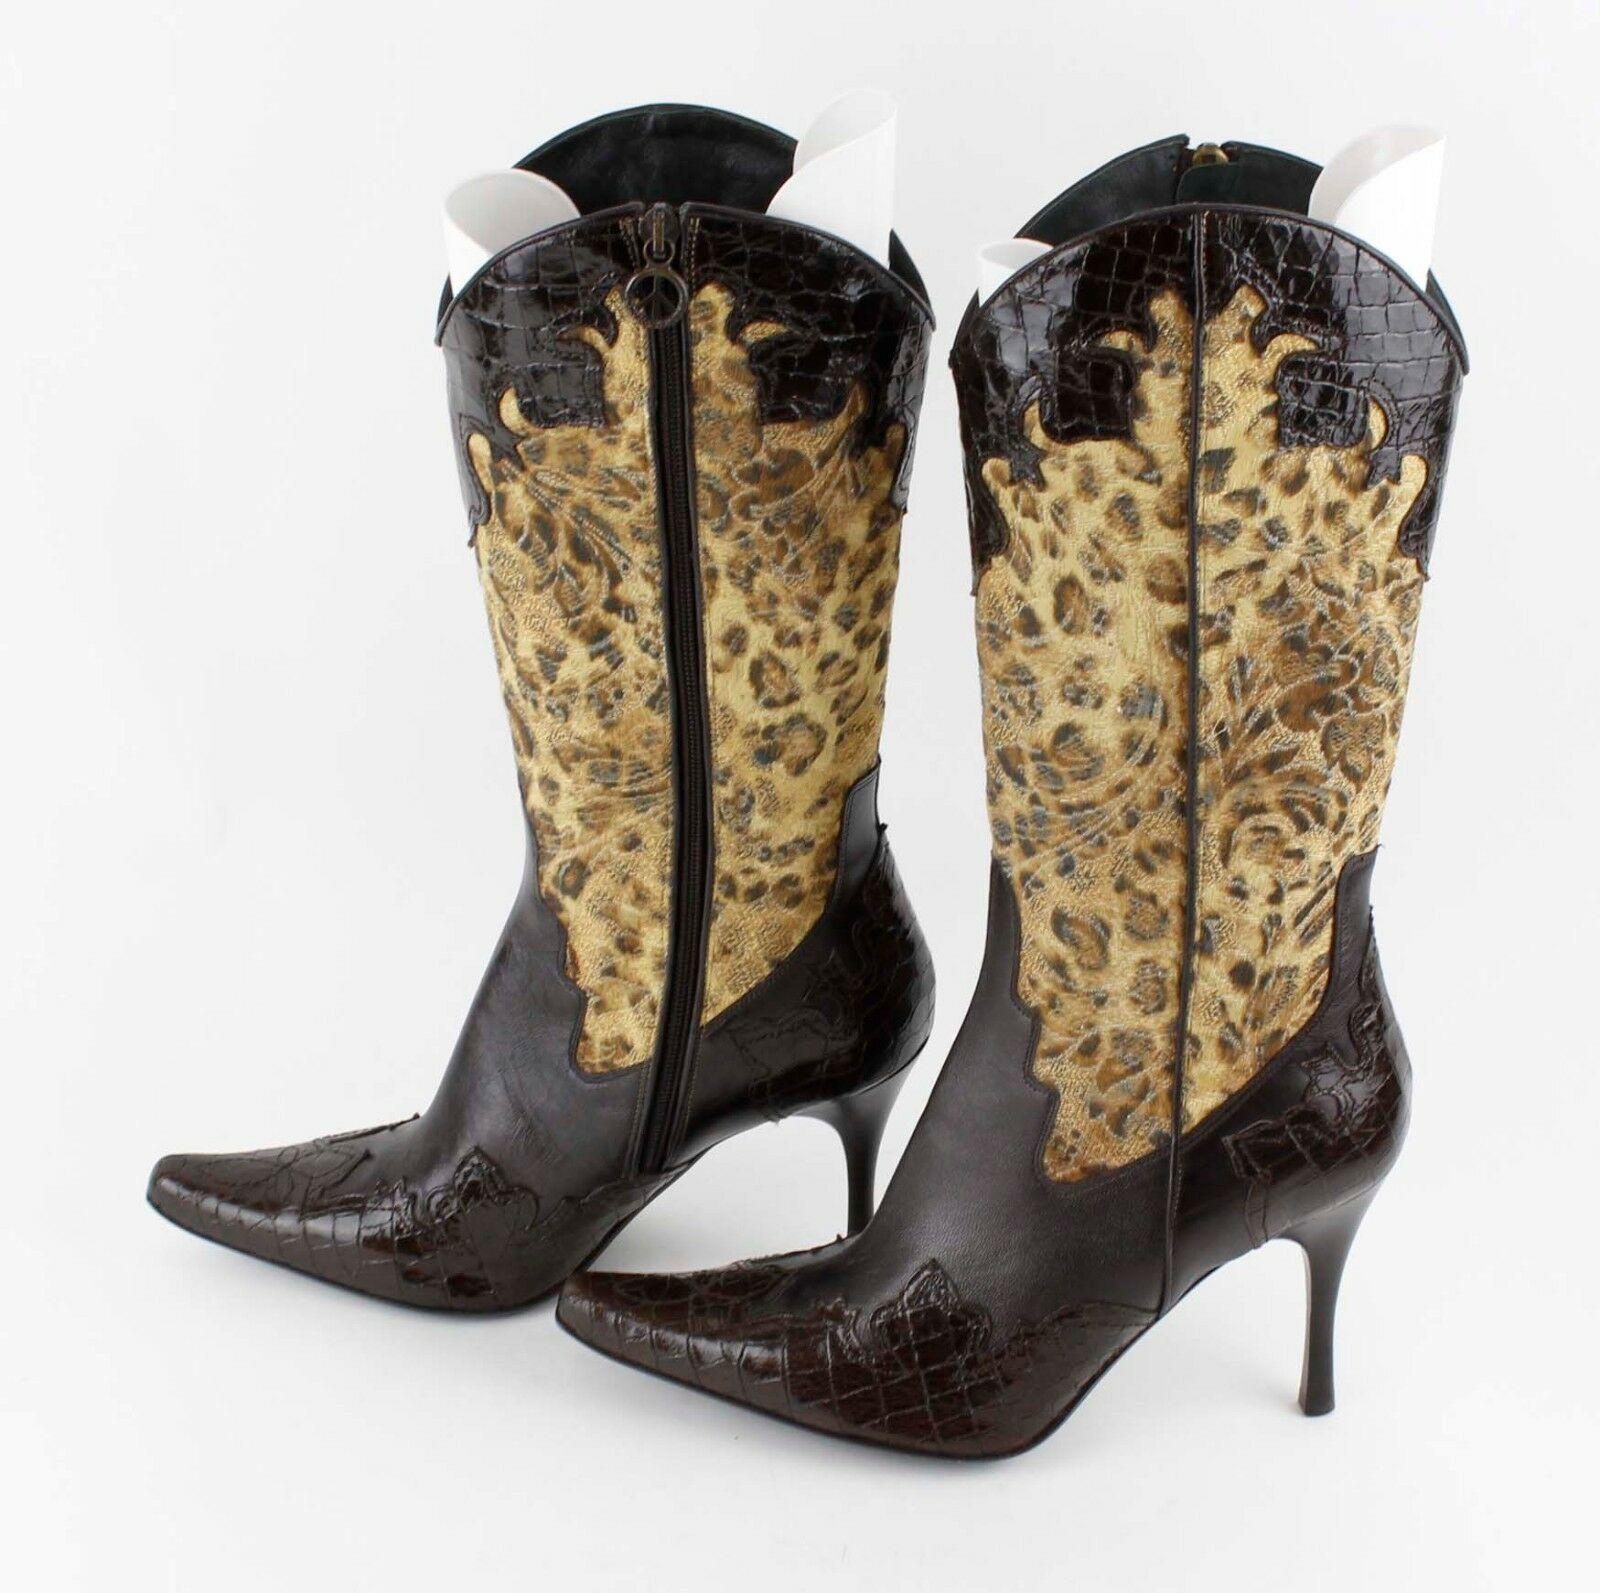 Donald J. Pliner Sz 9.5 VANE Chocolate Braun Gold Paisley Leopard Croc Stiefel LB